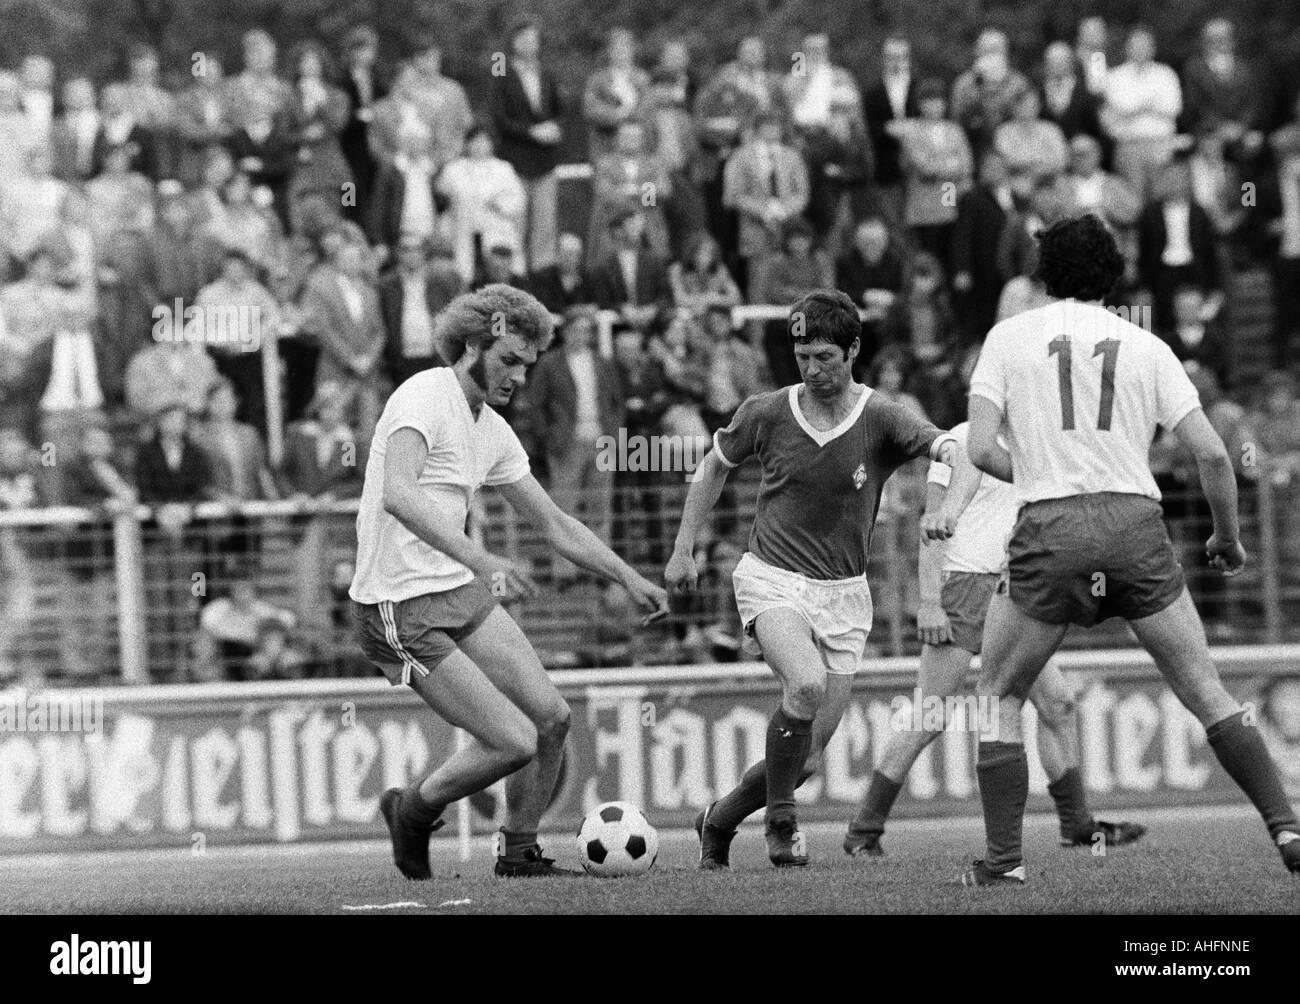 football, Bundesliga, 1971/1972, Rot-Weiss Oberhausen versus Werder Bremen 2:2, Niederrhein Stadium in Oberhausen, scene of the match, duel between Uwe Kliemann (RWO) left and Arnold Schuetz (Bremen), right Ludwig Denz (RWO, 11) - Stock Image